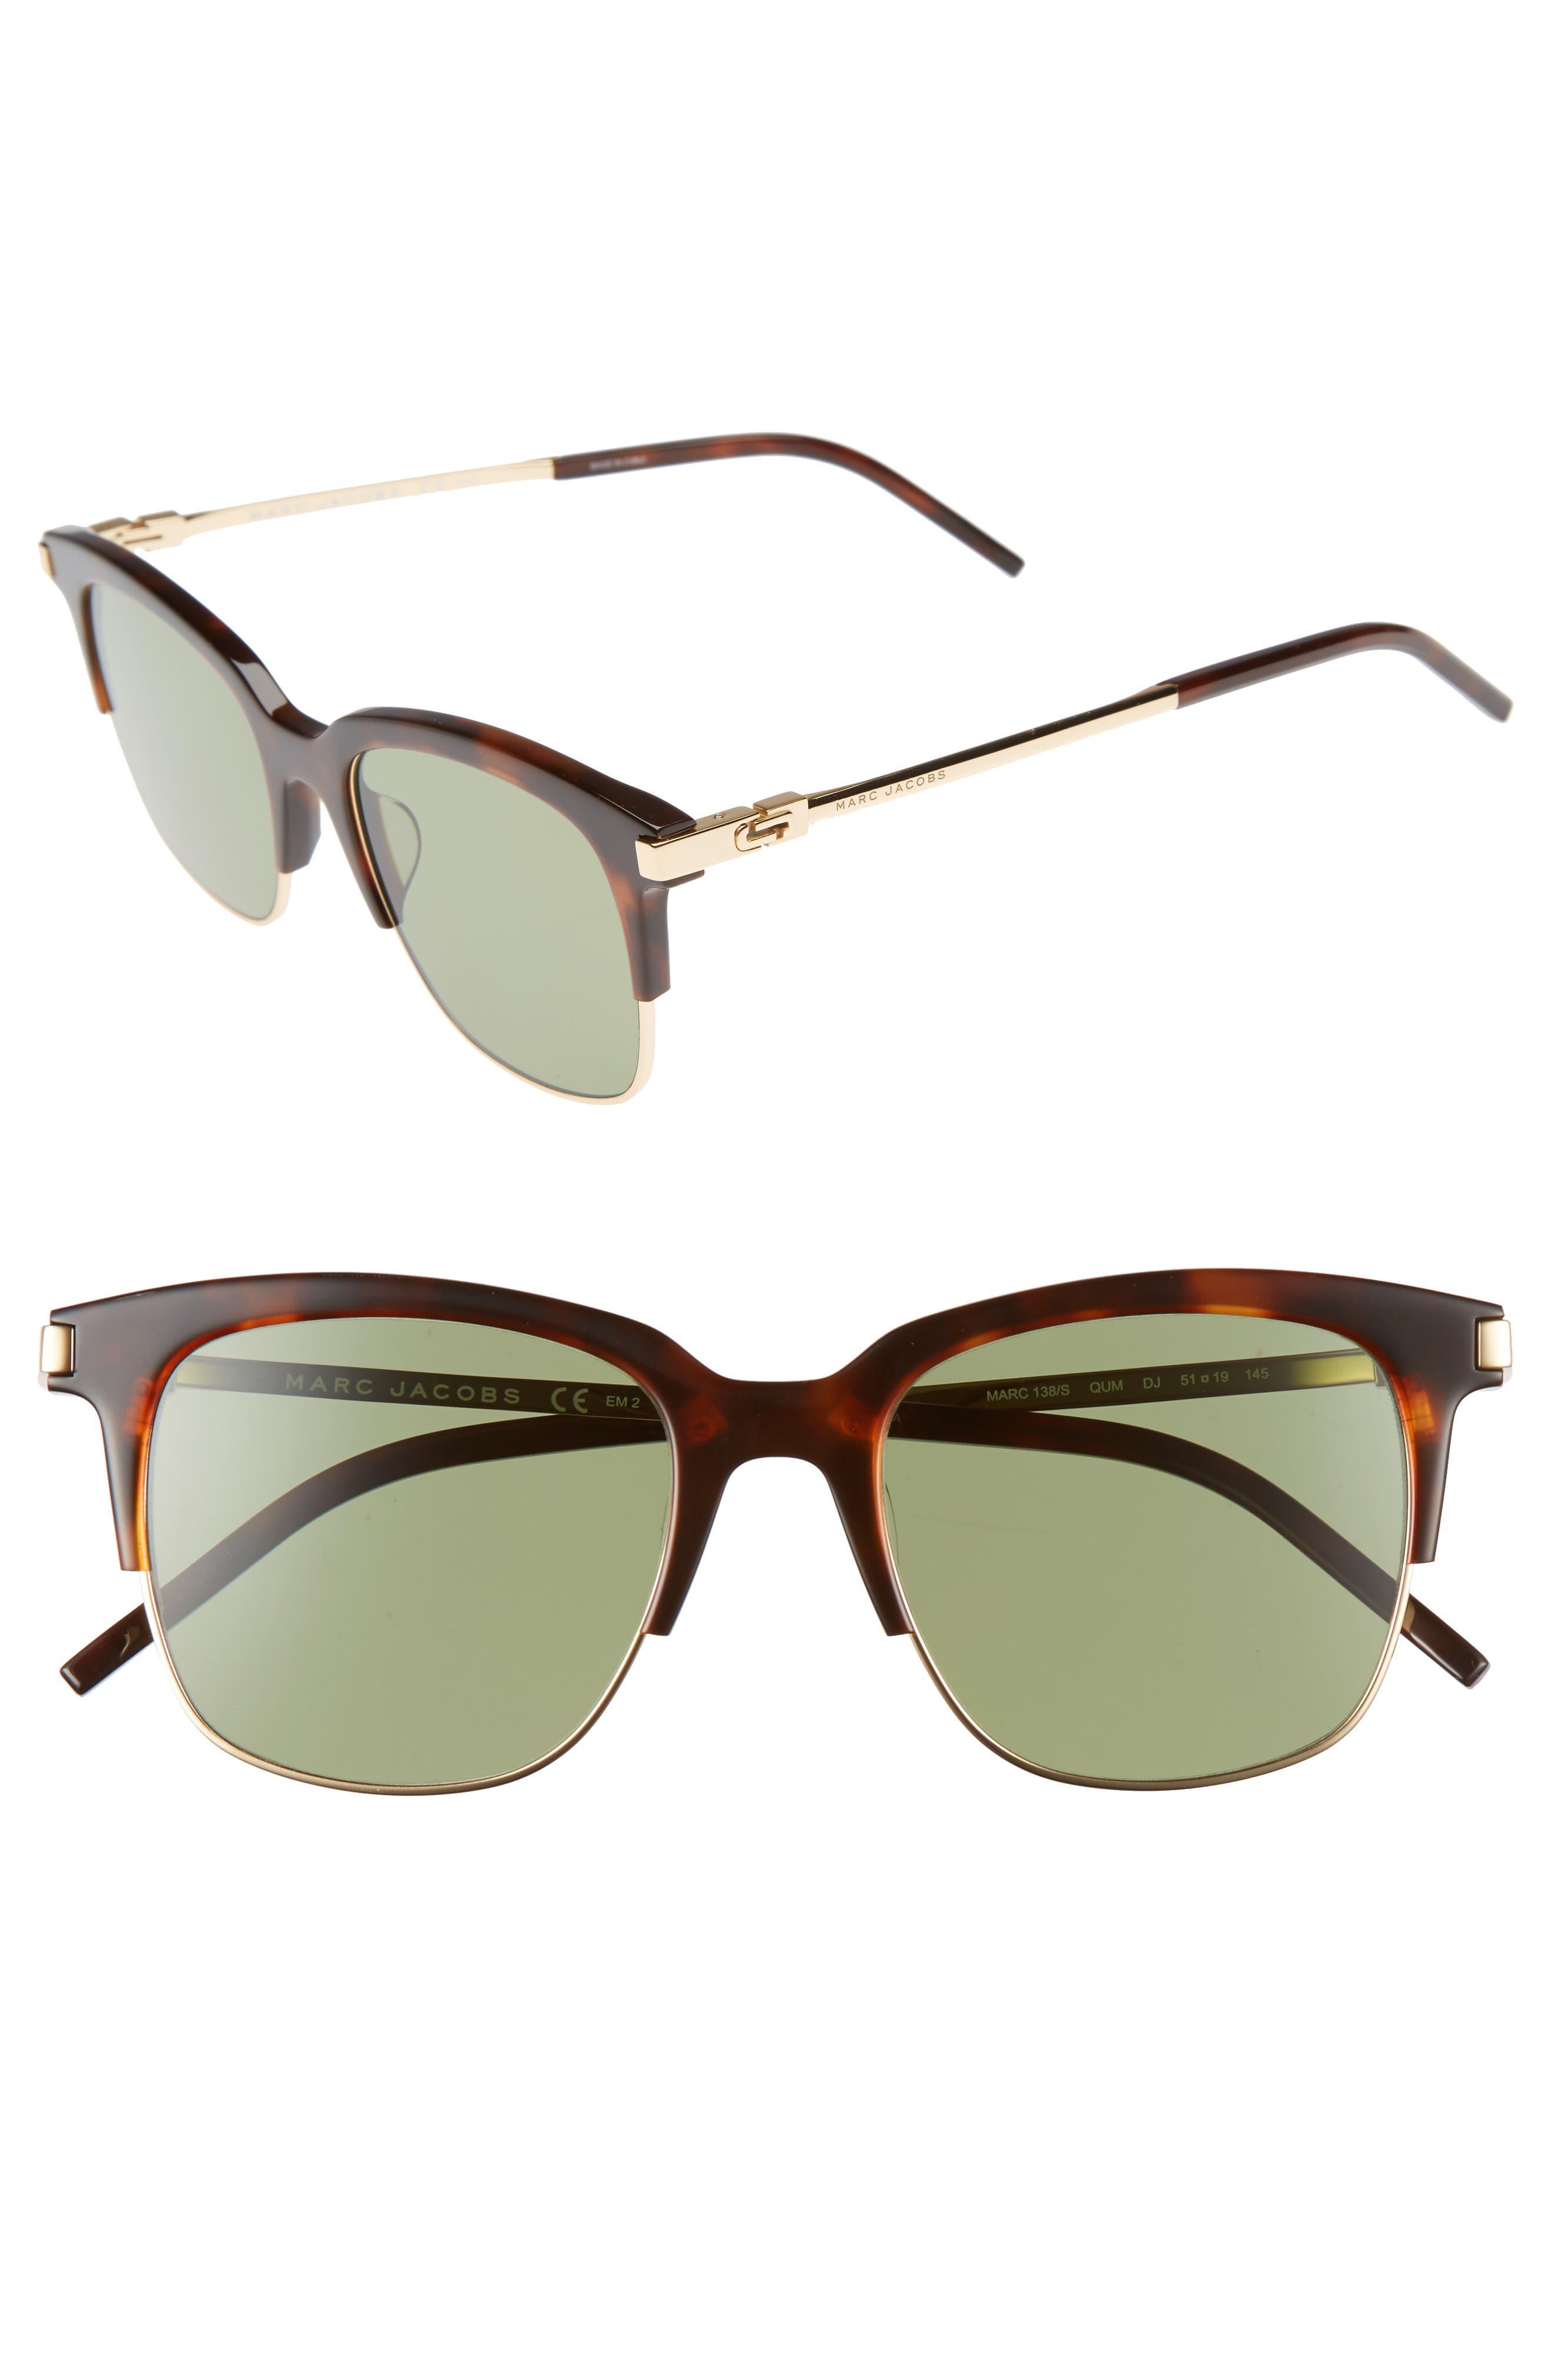 51mm Sunglasses,                         Main,                         color, Havana